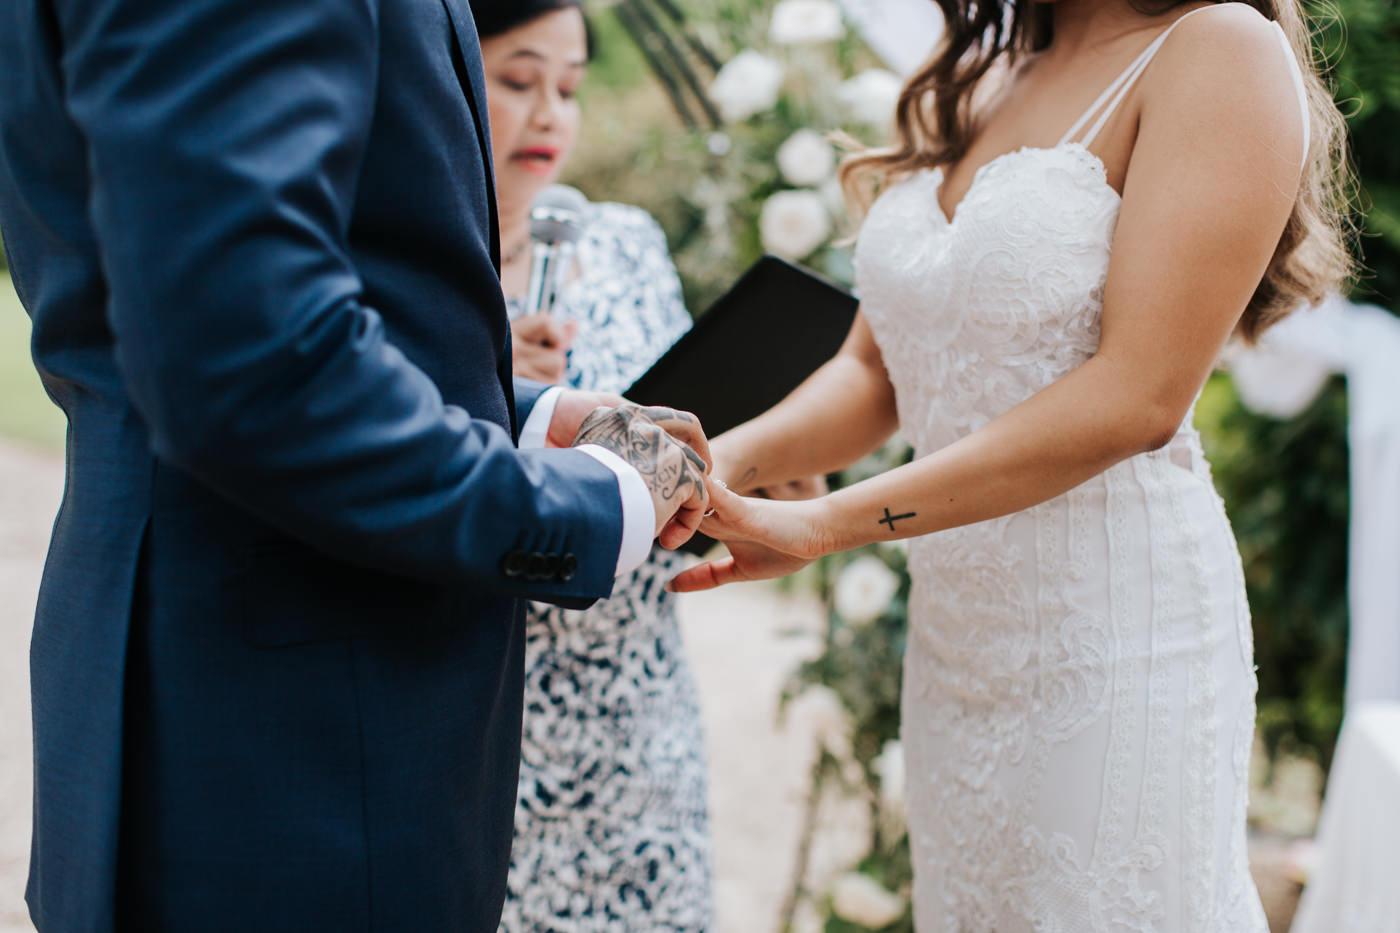 Nick & Vanezza - Fernbank Farm Wedding - Samantha Heather Photography-69.jpg